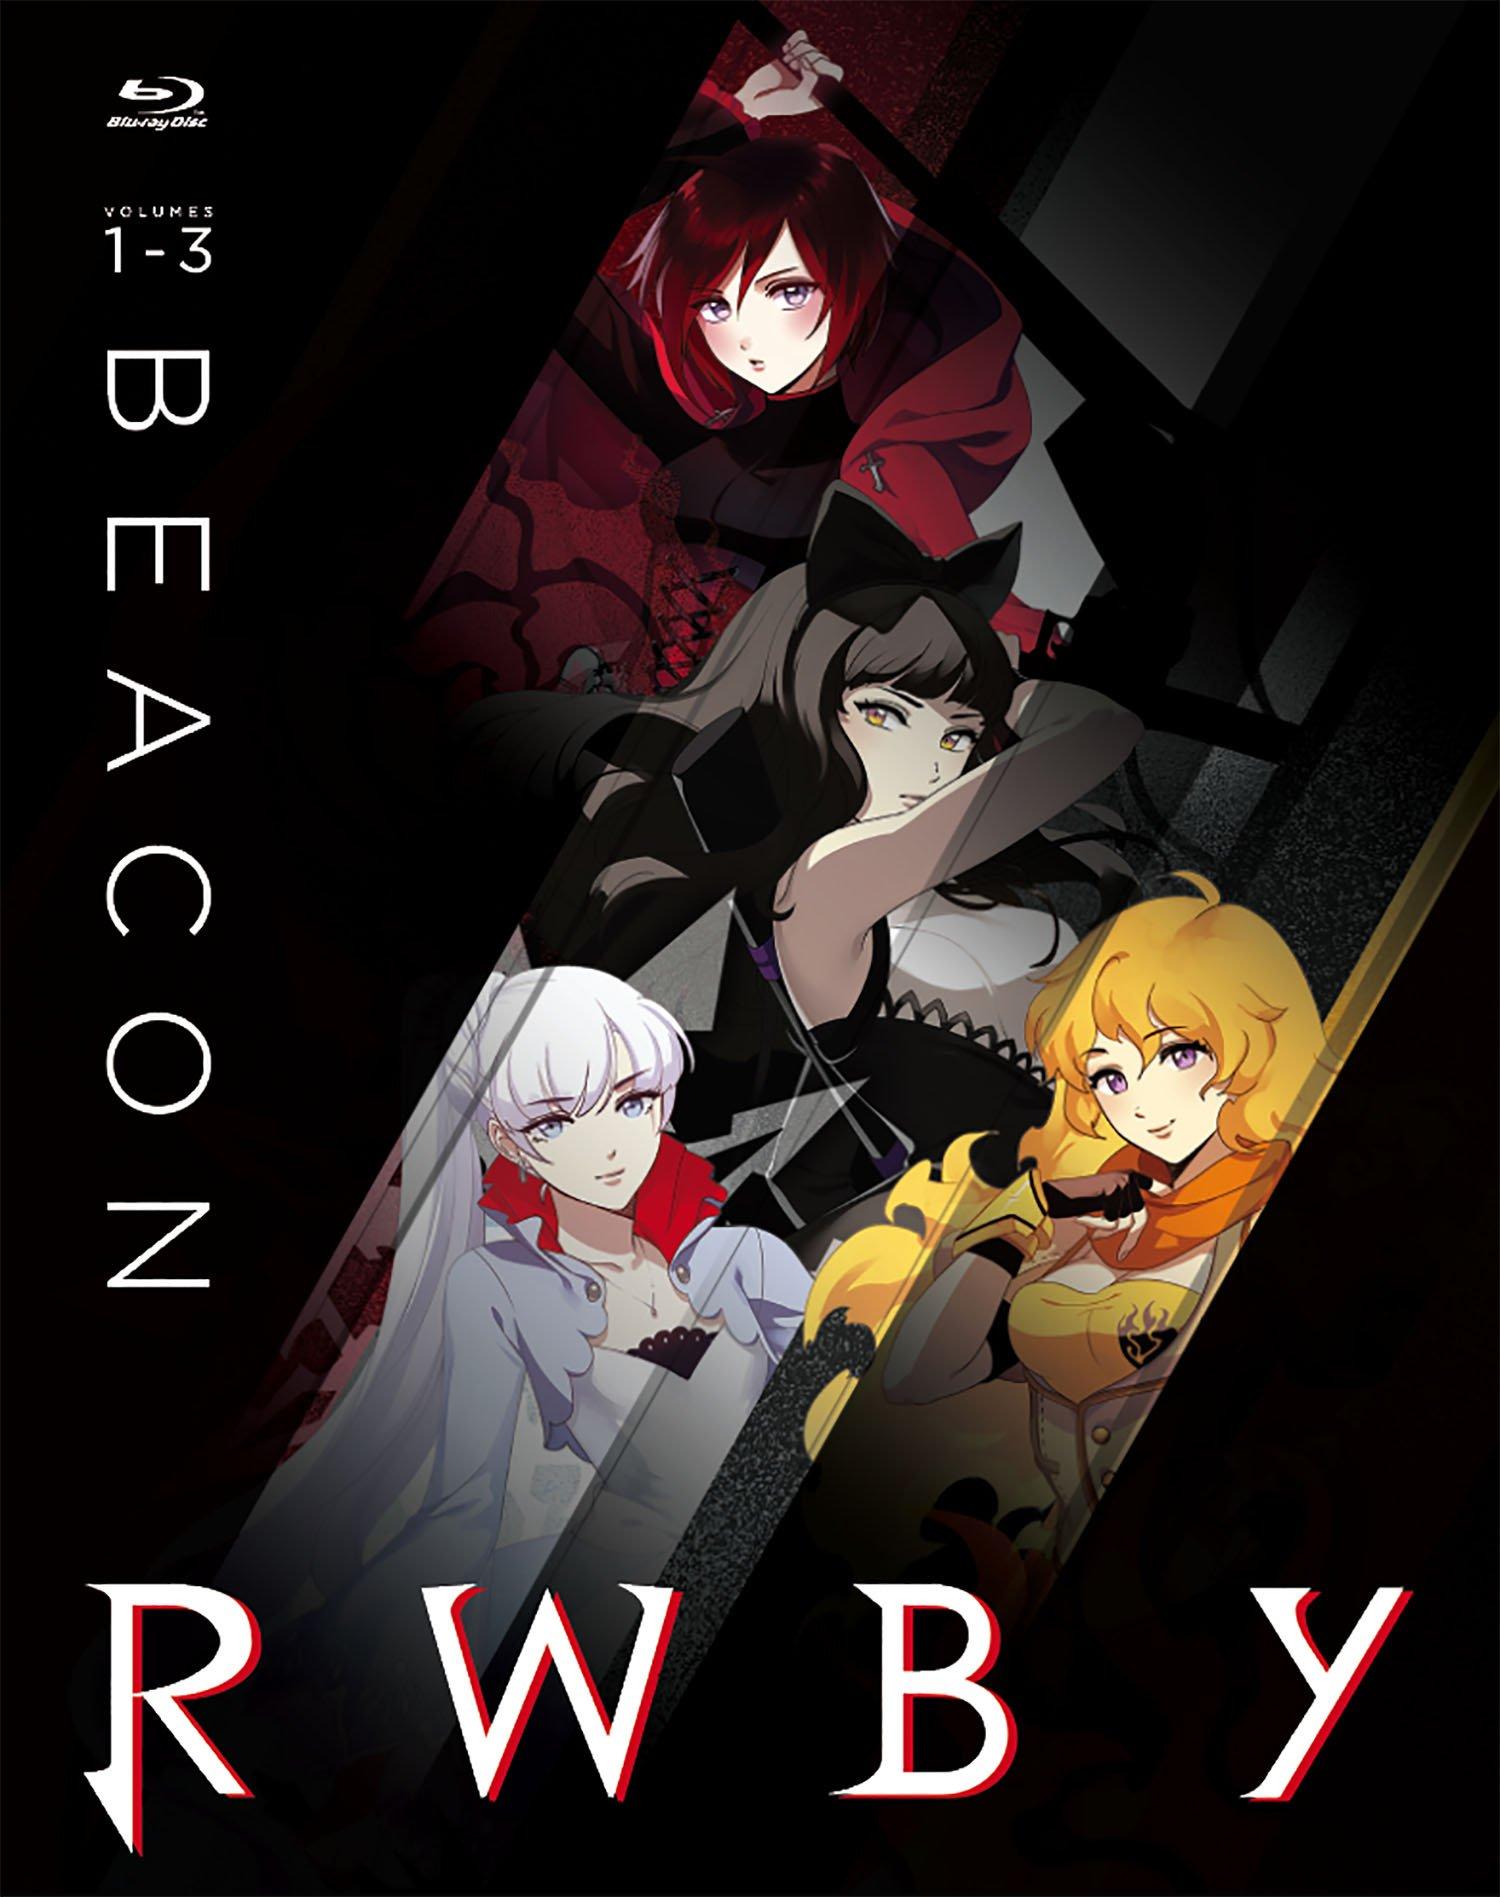 Blu-ray : RWBY, Vol. 1-3: Beacon (Steelbook, 3 Pack, Widescreen, 3 Disc)